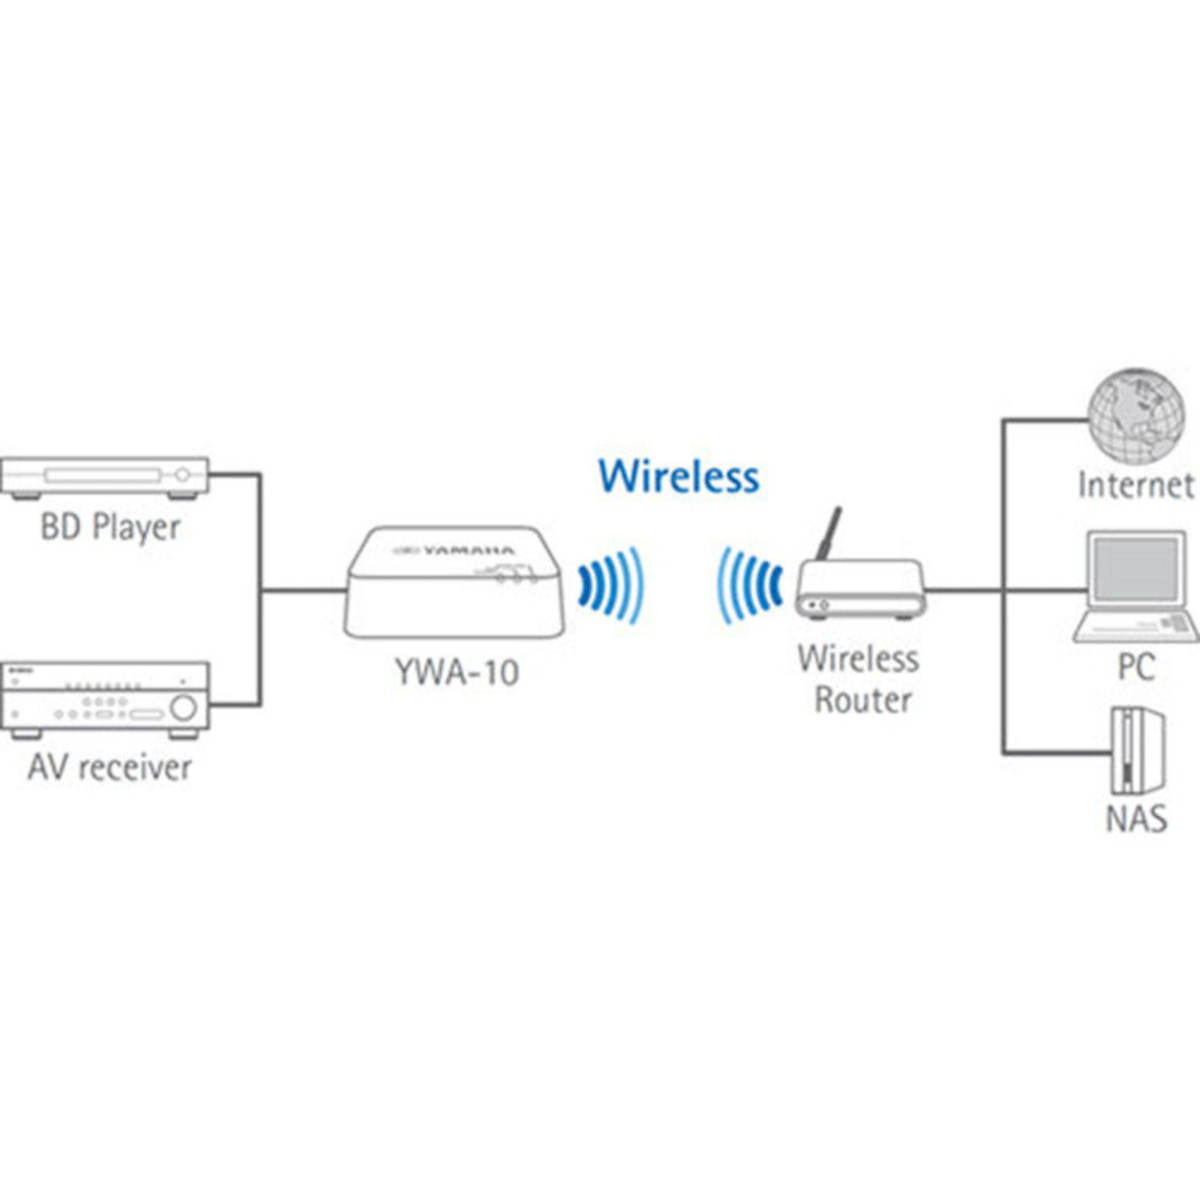 SONDERANGEBOTYamaha YWA-10 Wireless Netzwerk-Adapter bei Gear4music